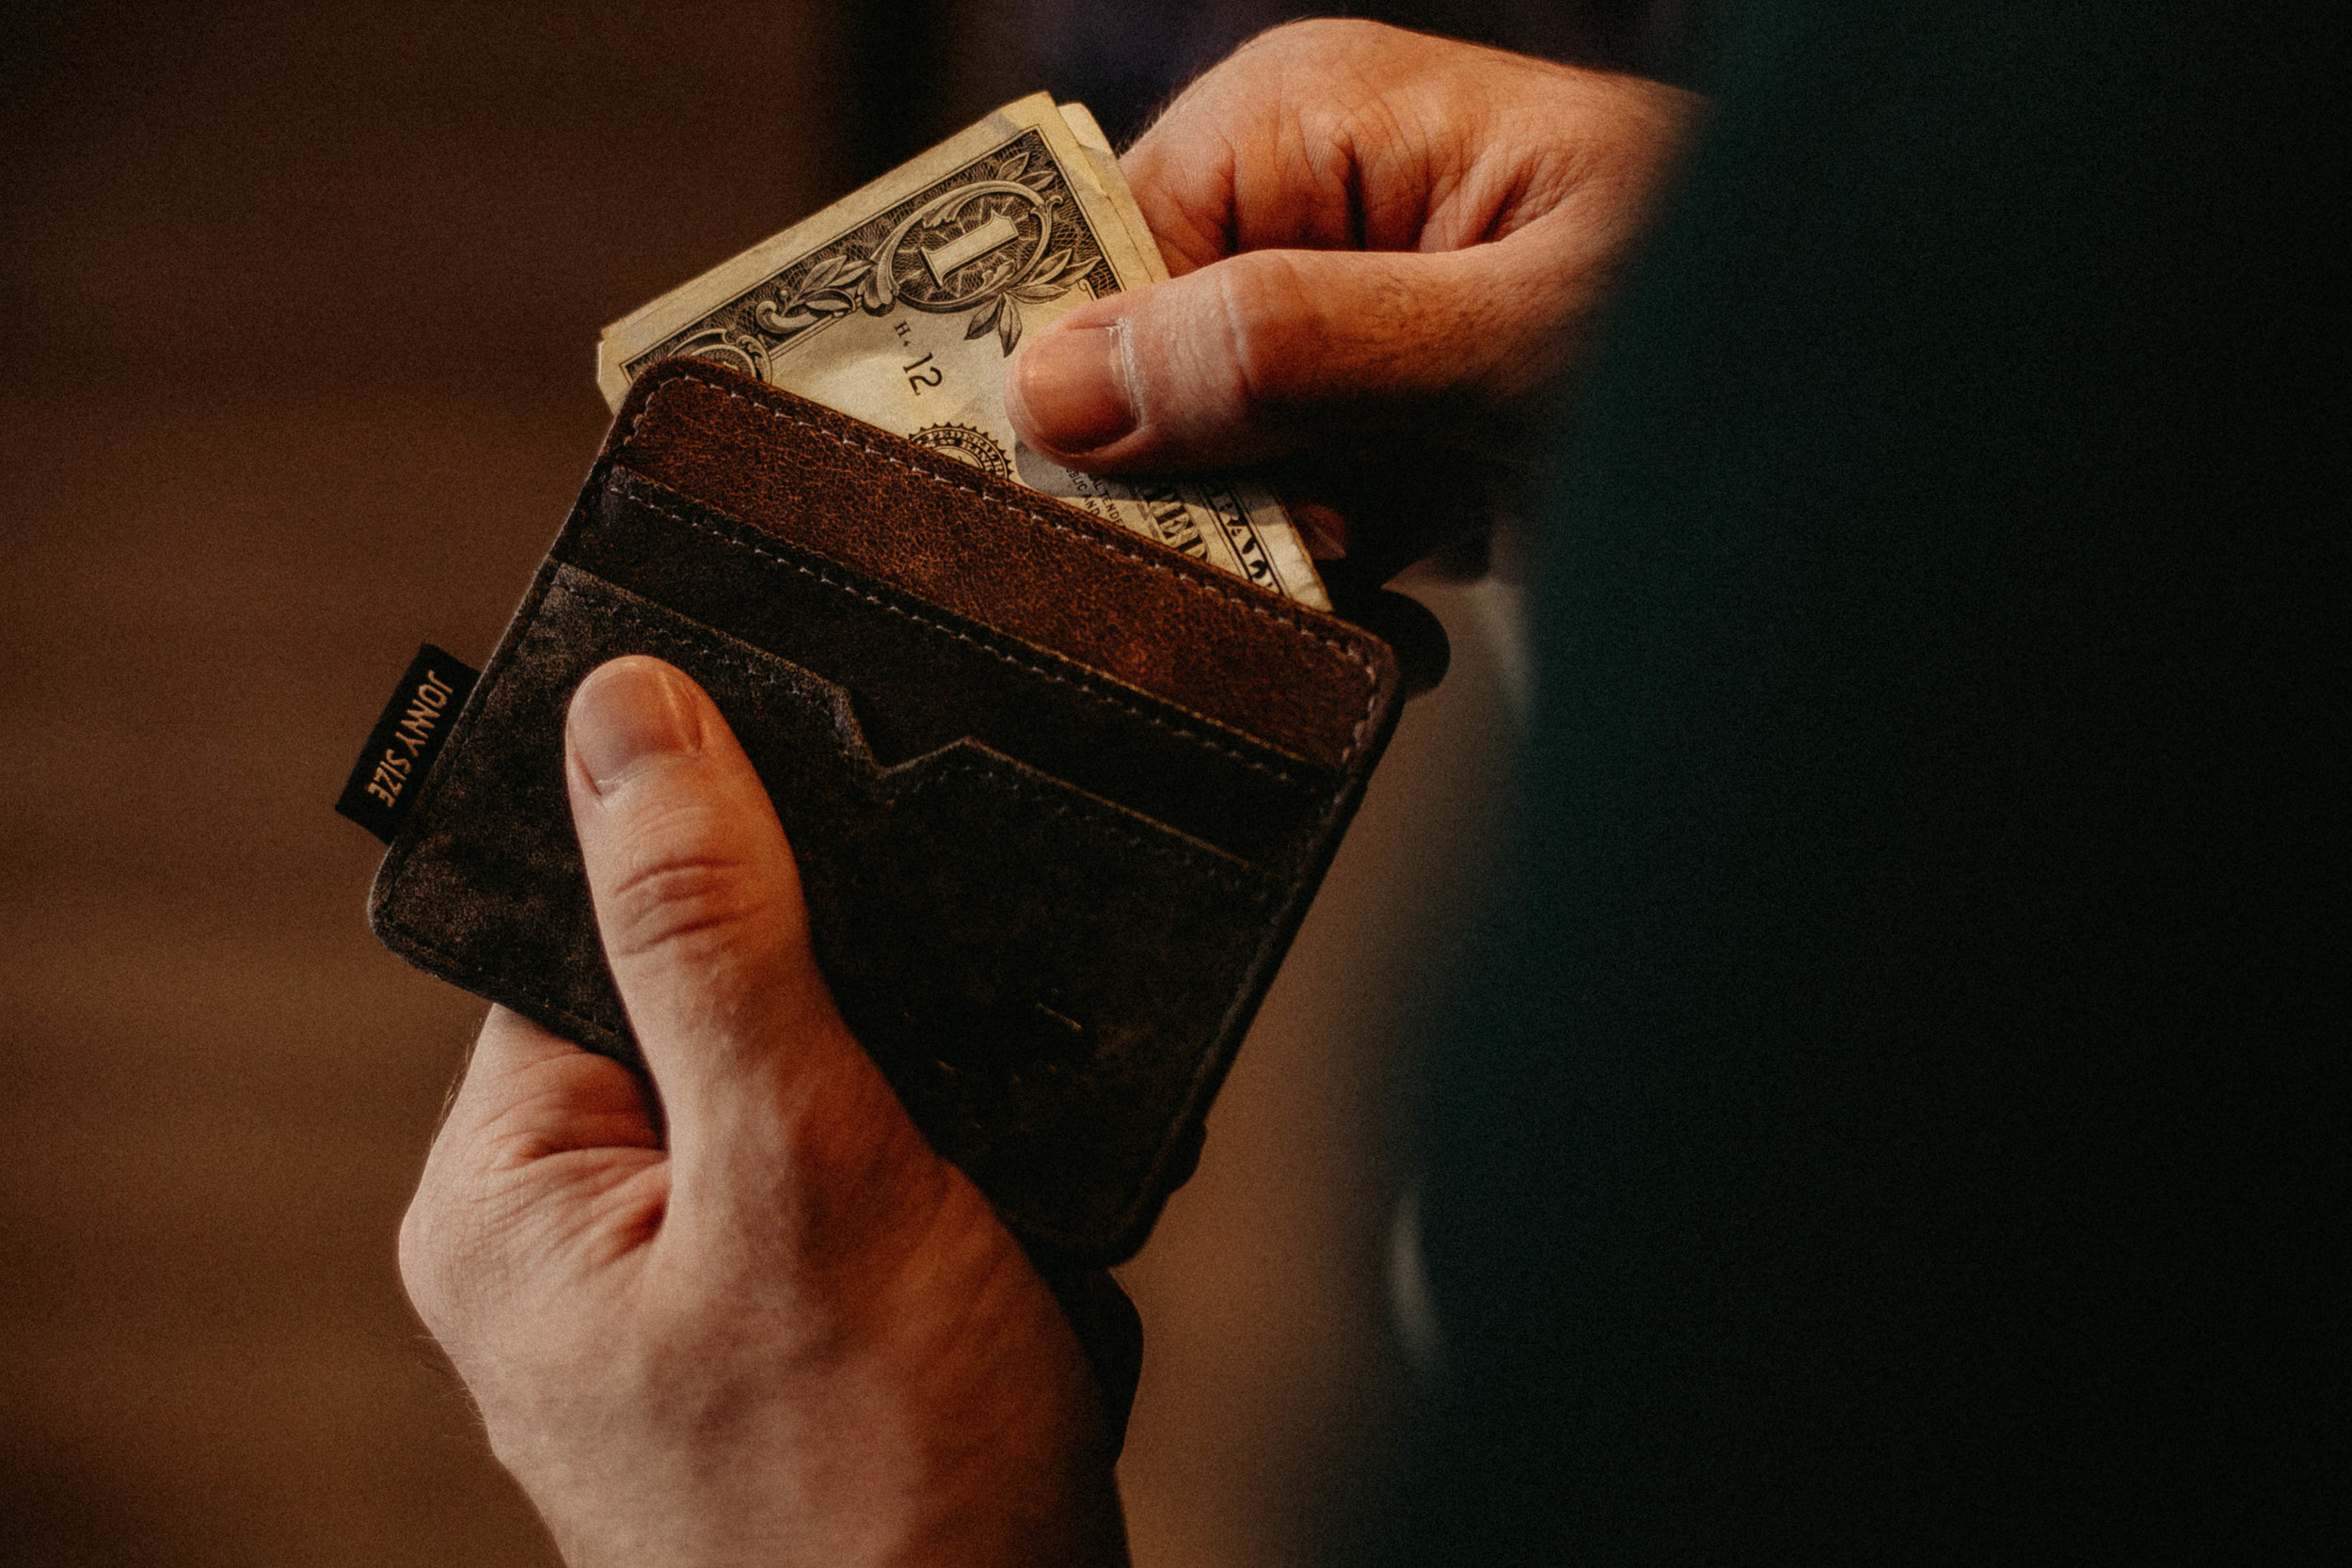 Keep some money handy